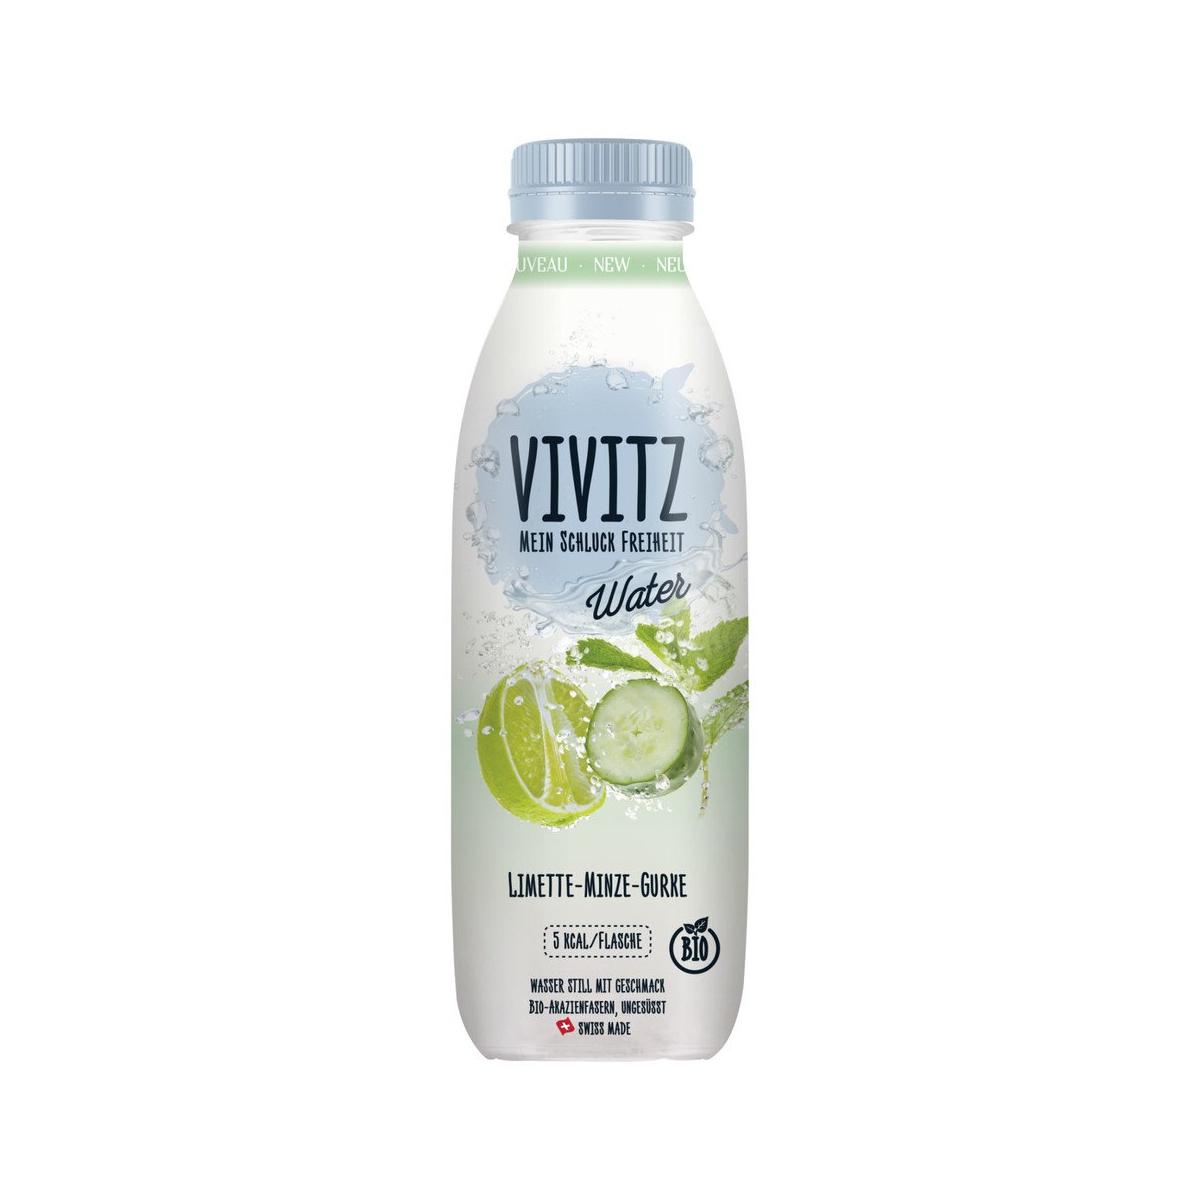 Vivitz Water Limette-Minze